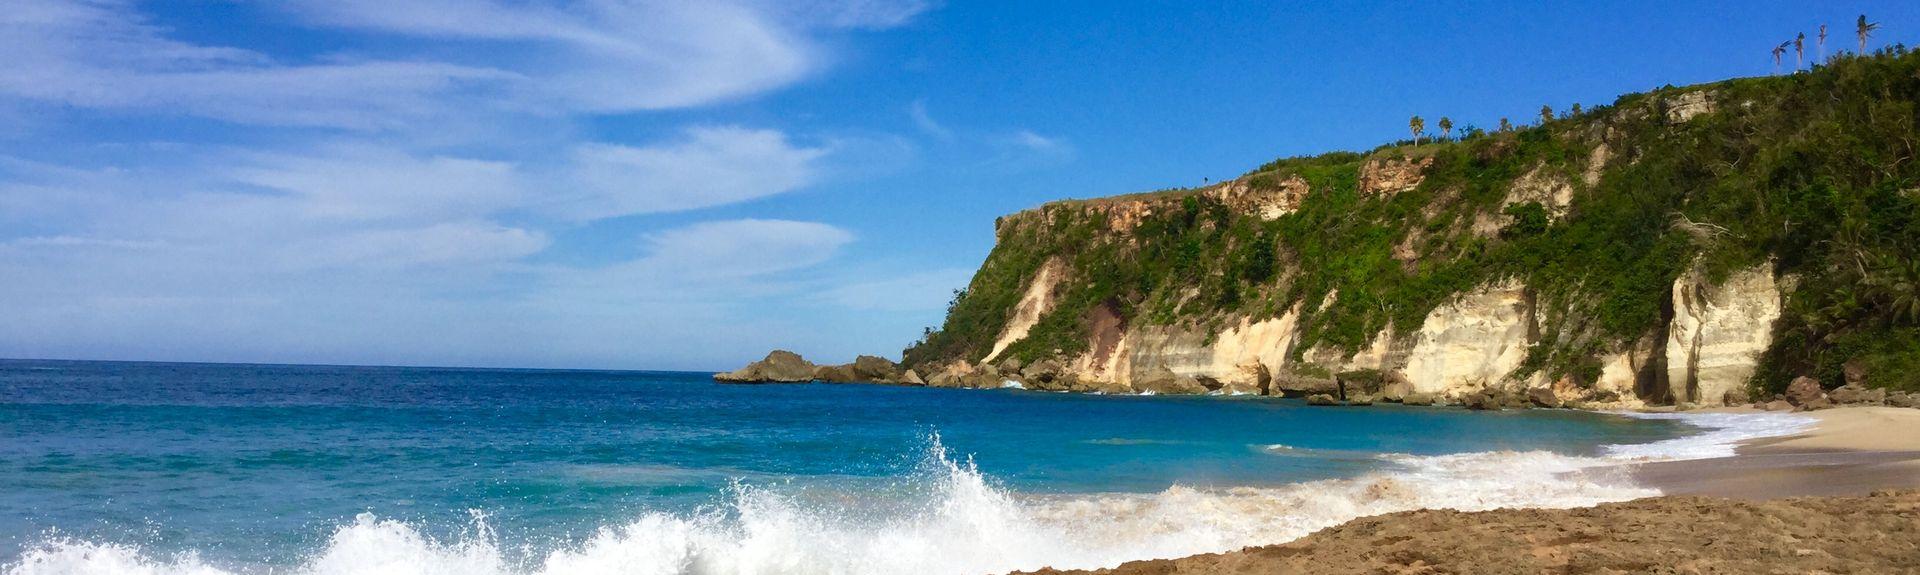 Domes Beach, Rincon, Puerto Rico